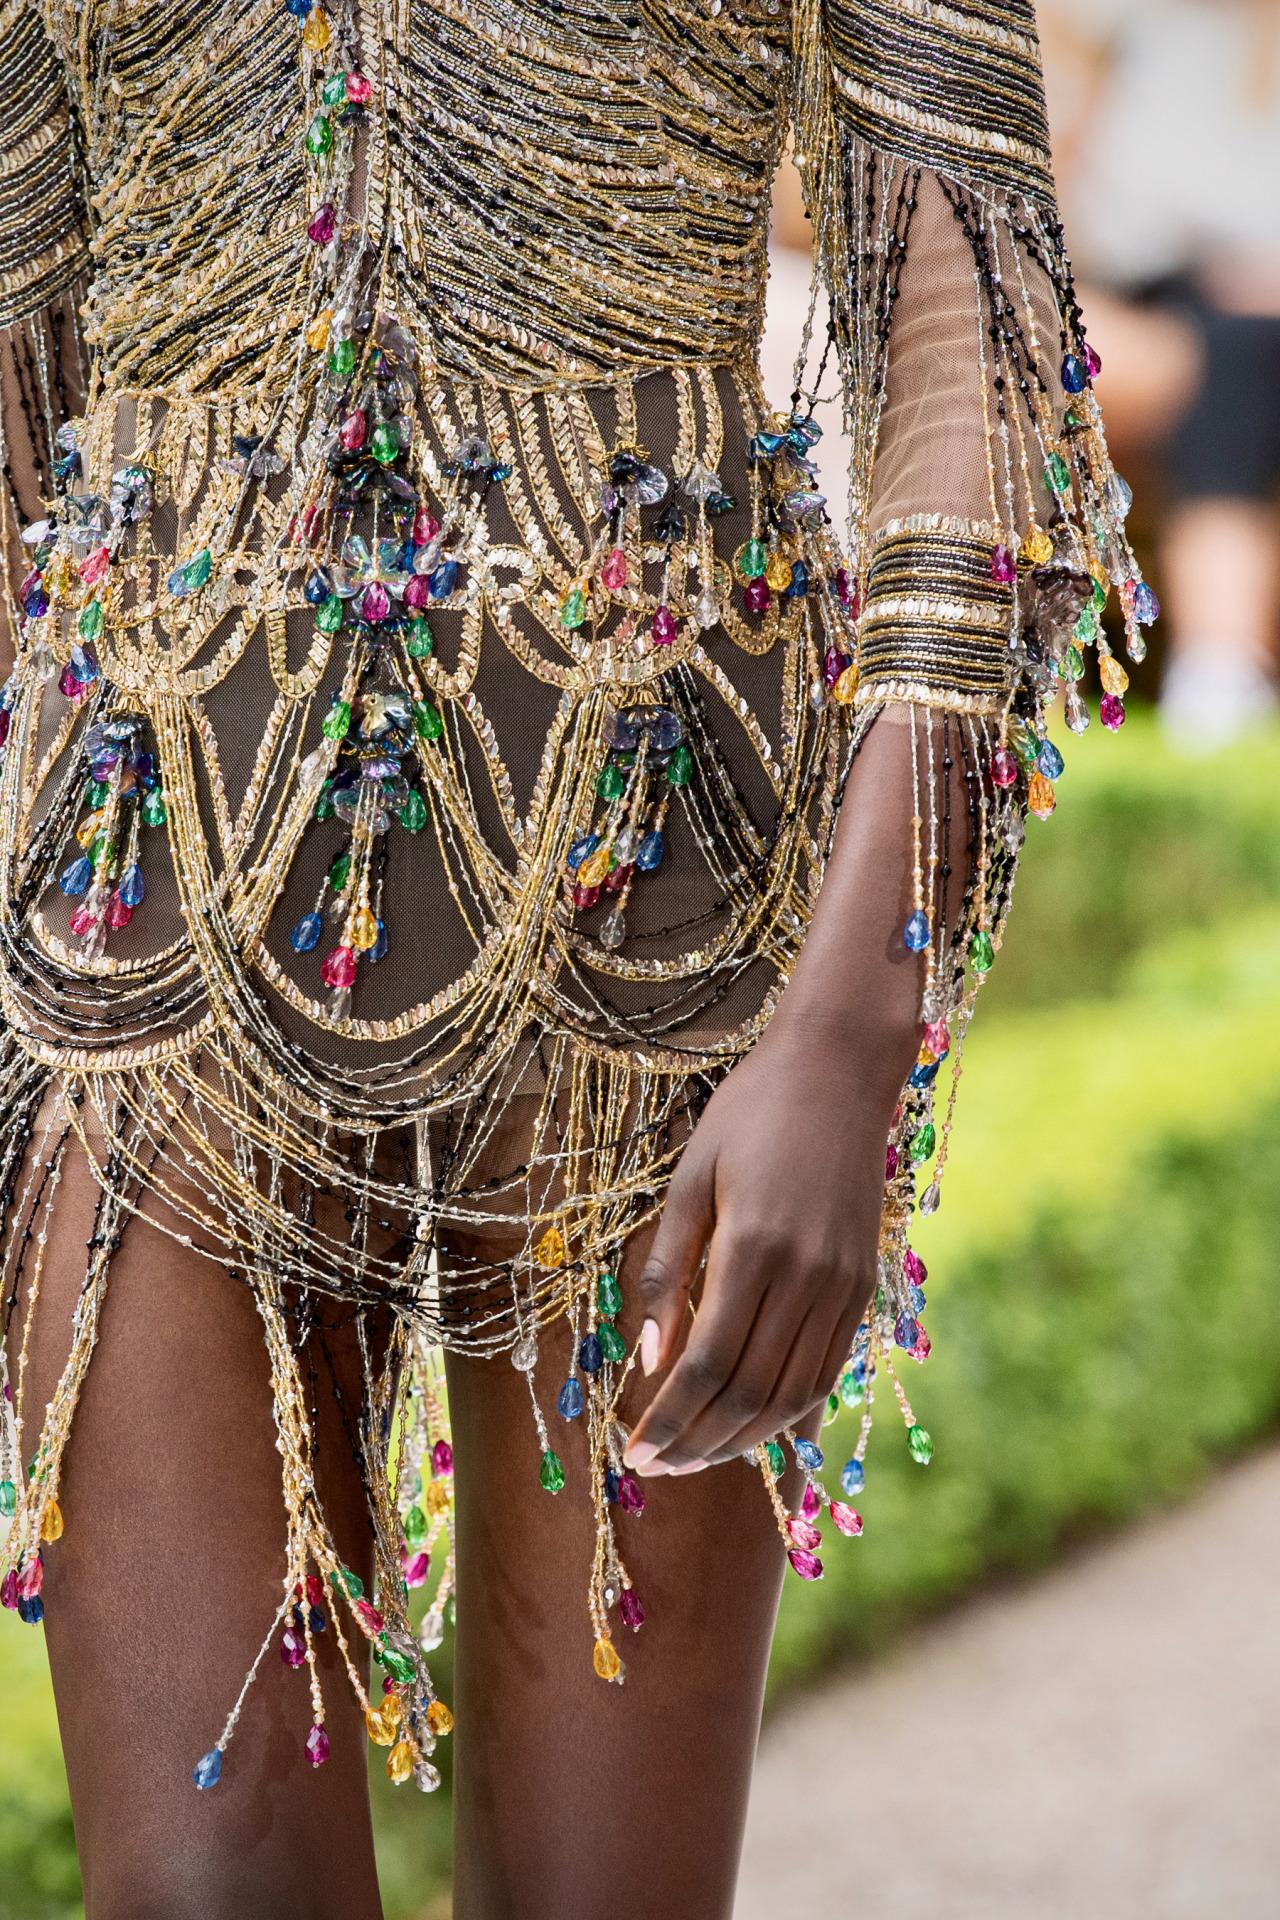 Zuhair Murad  Fall/Winter 2021 Couture #Zuhair Murad#fashion#style#haute couture#pfw#runway#catwalk#couture#gowns#fashionedit#fashion edit#fashion details#details